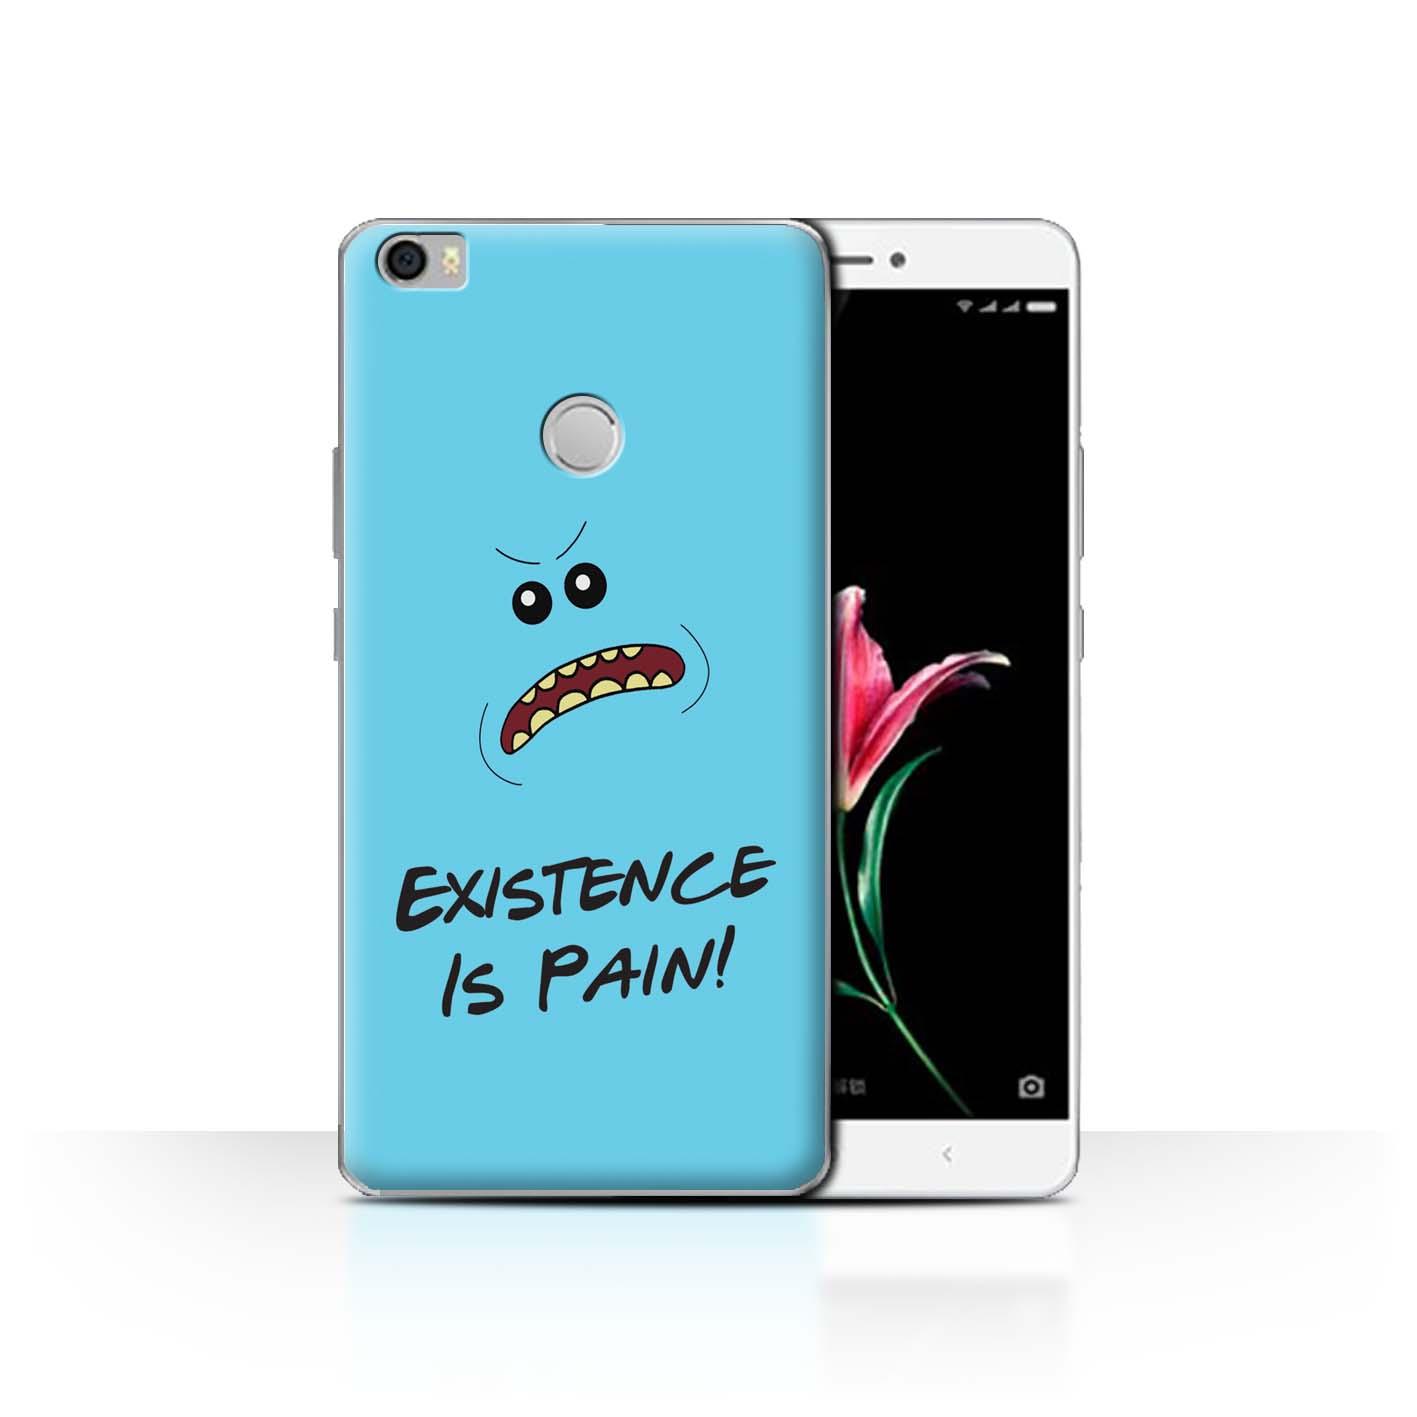 Coque-Etui-Housse-de-Stuff4-pour-Xiaomi-Mi-Max-Tele-Alien-Drole-Dessin-Anime